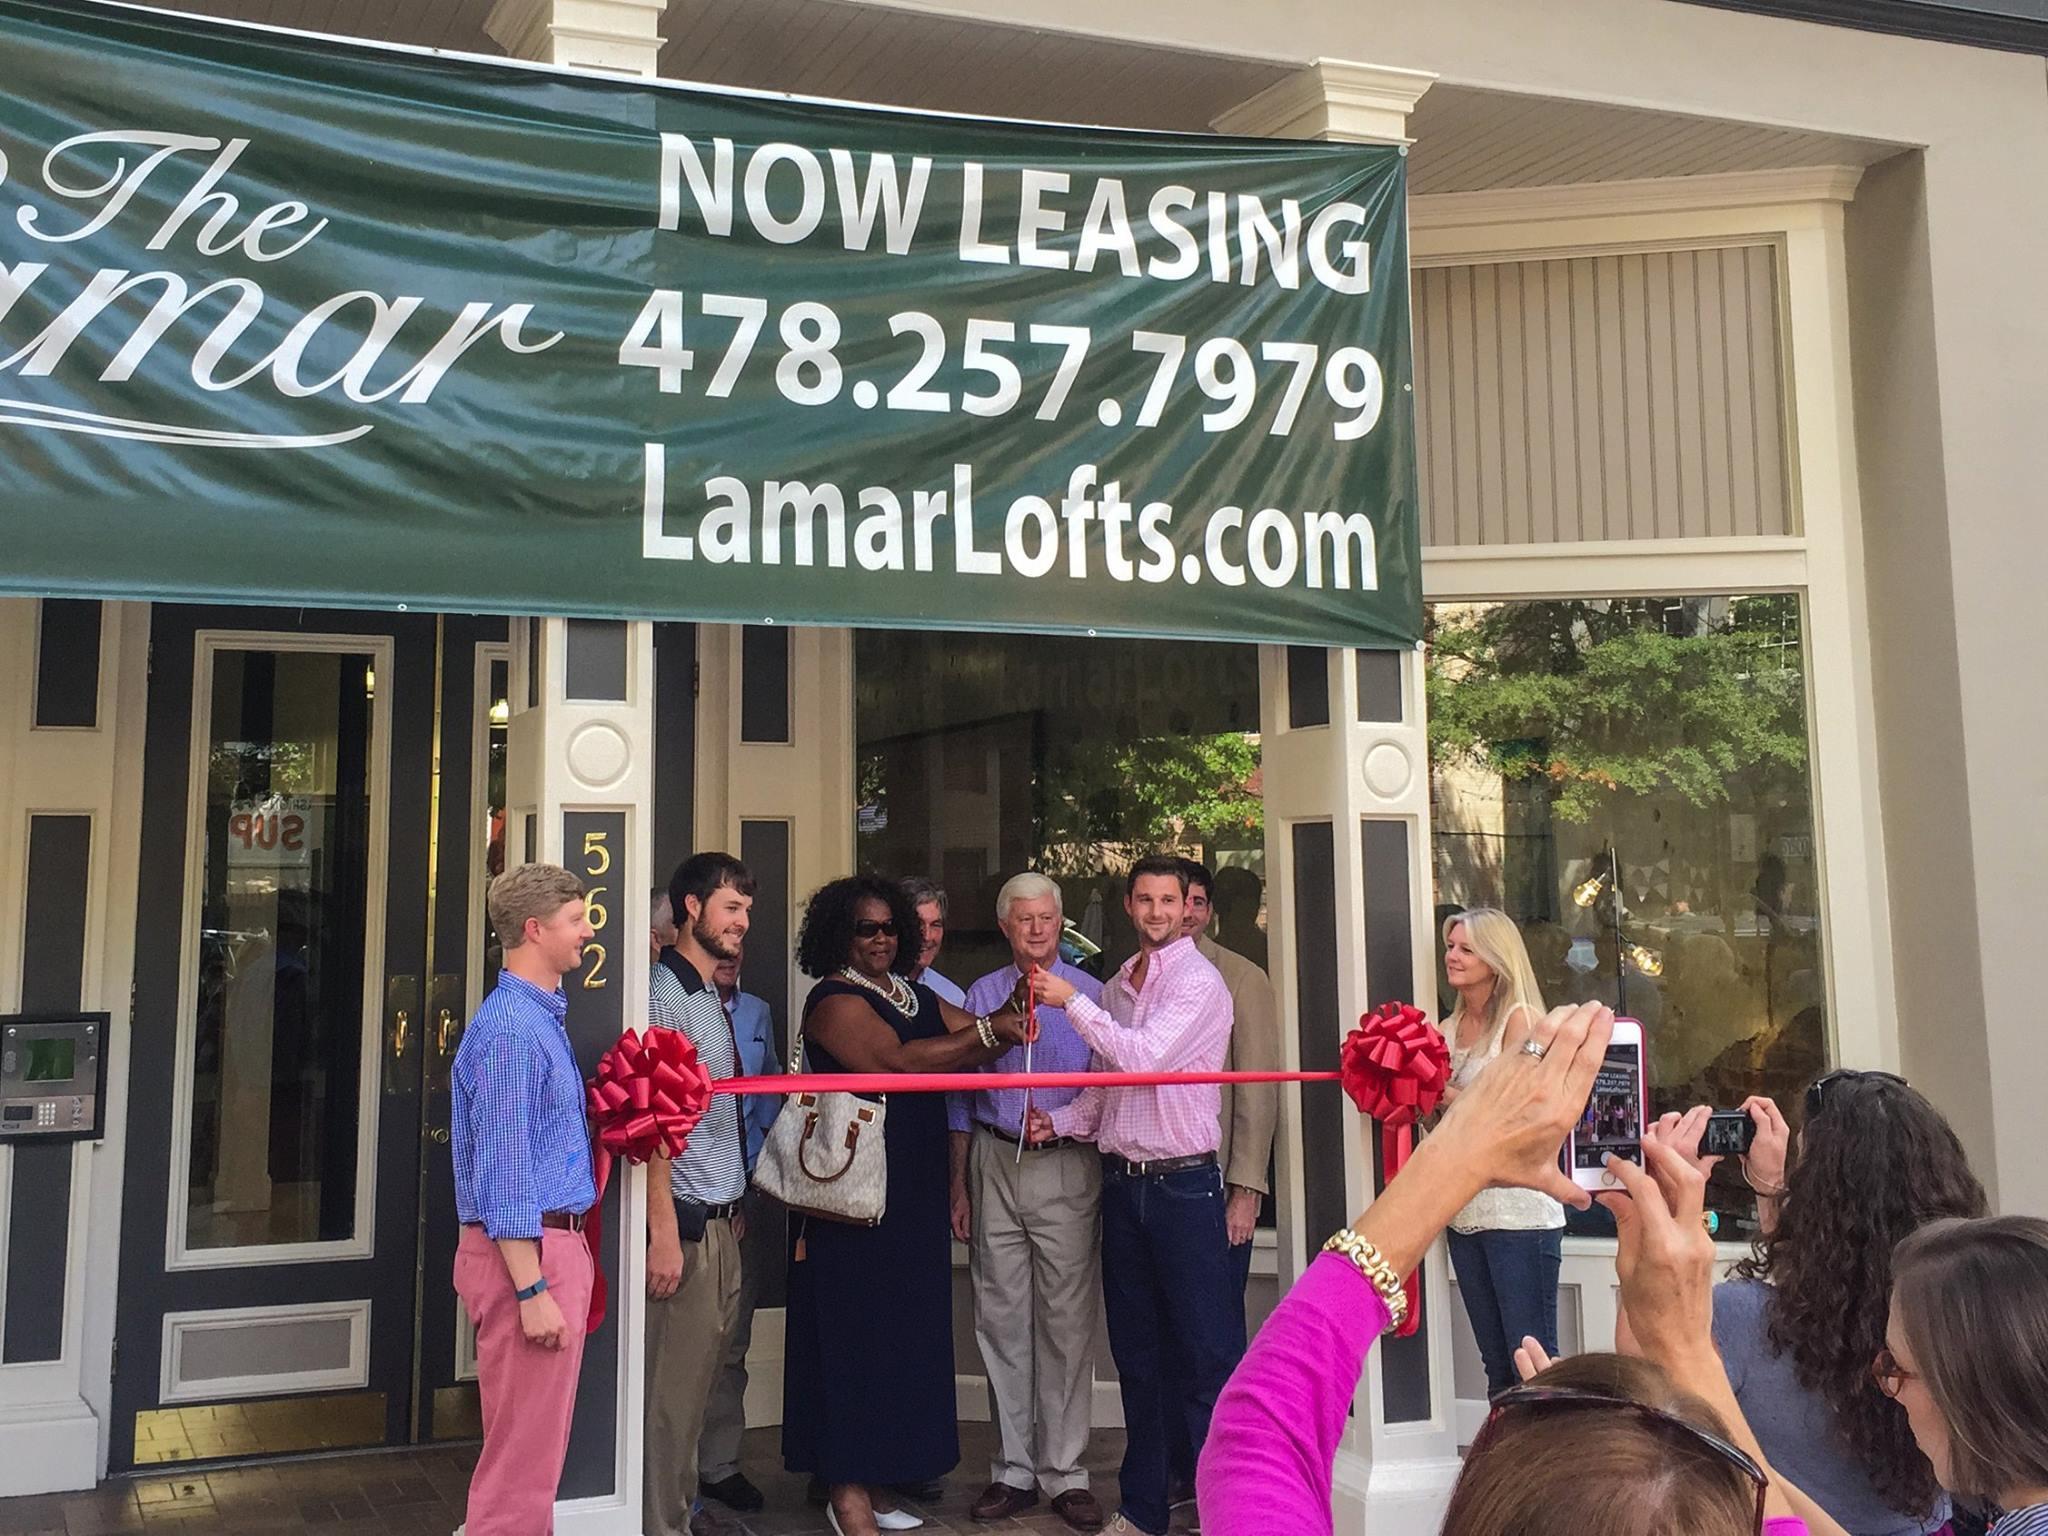 The Lamar Grand Opening